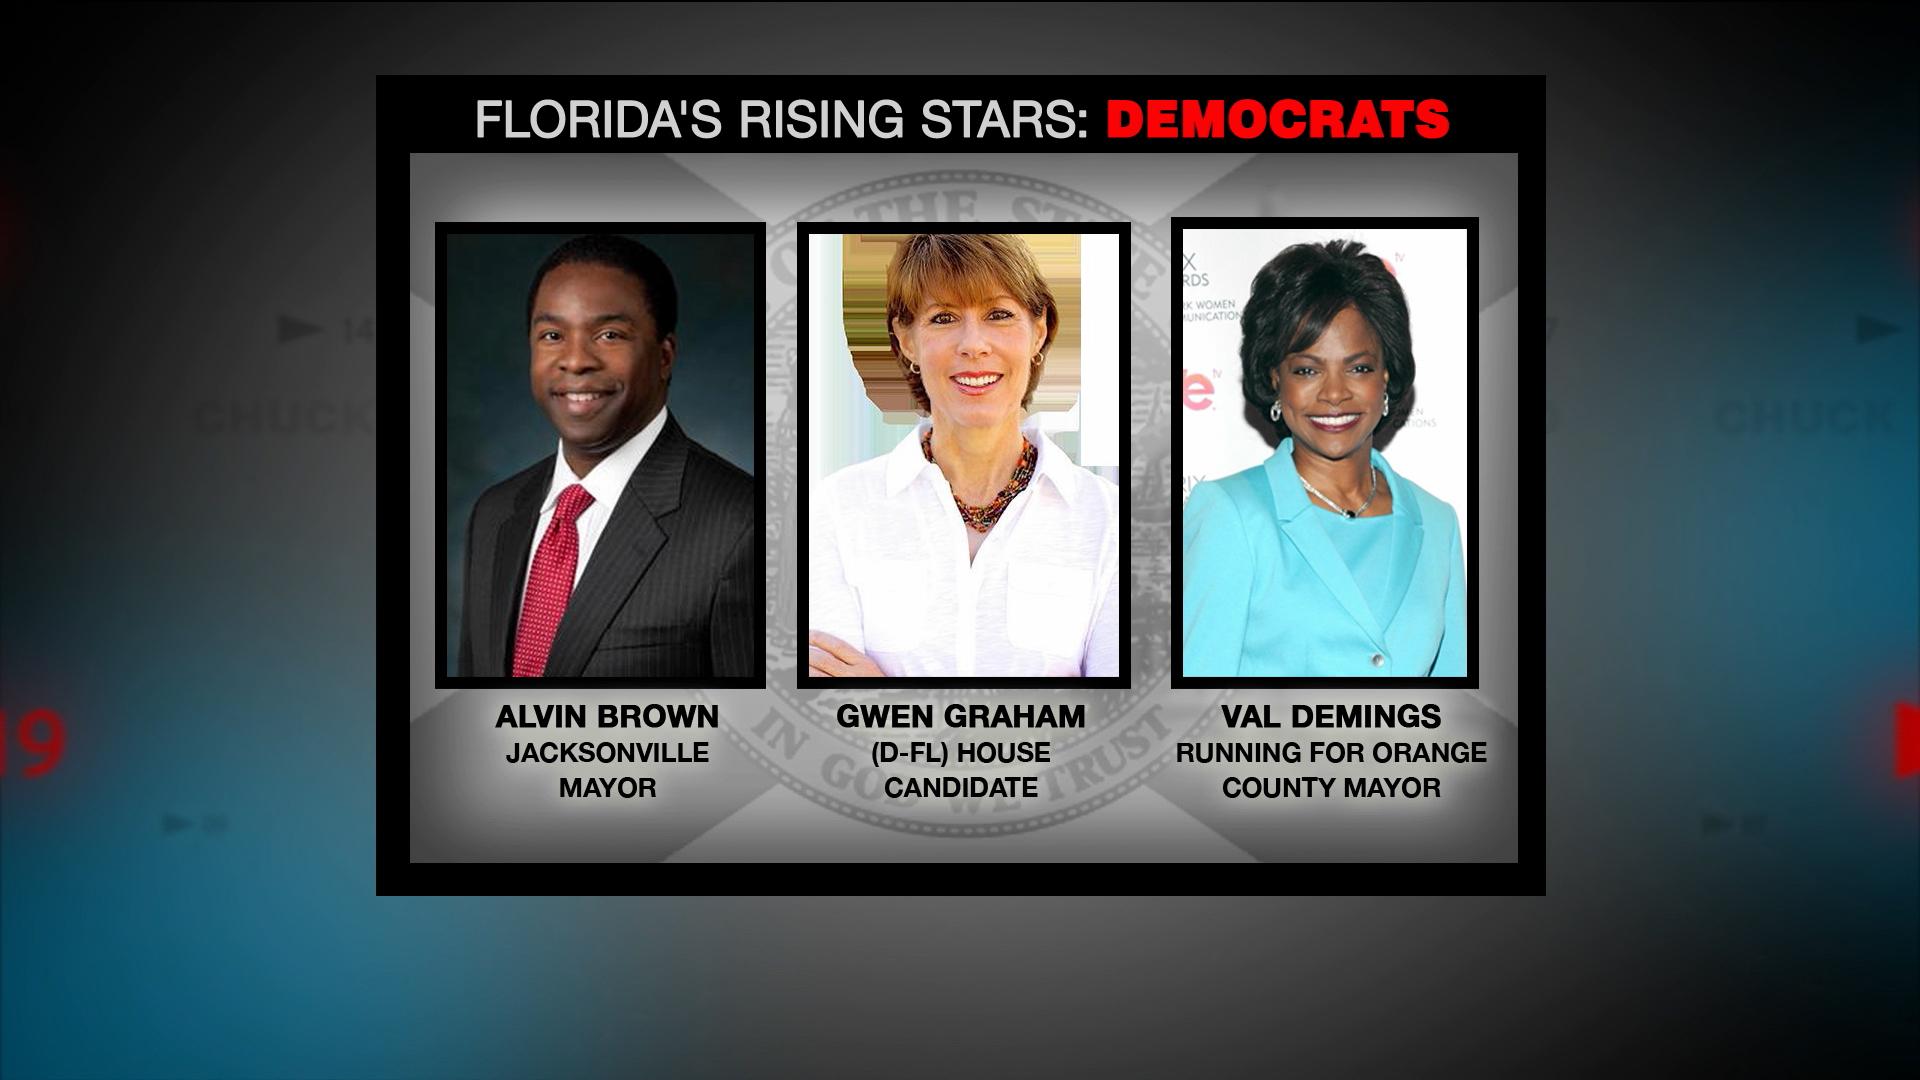 TDR50: Florida's rising stars